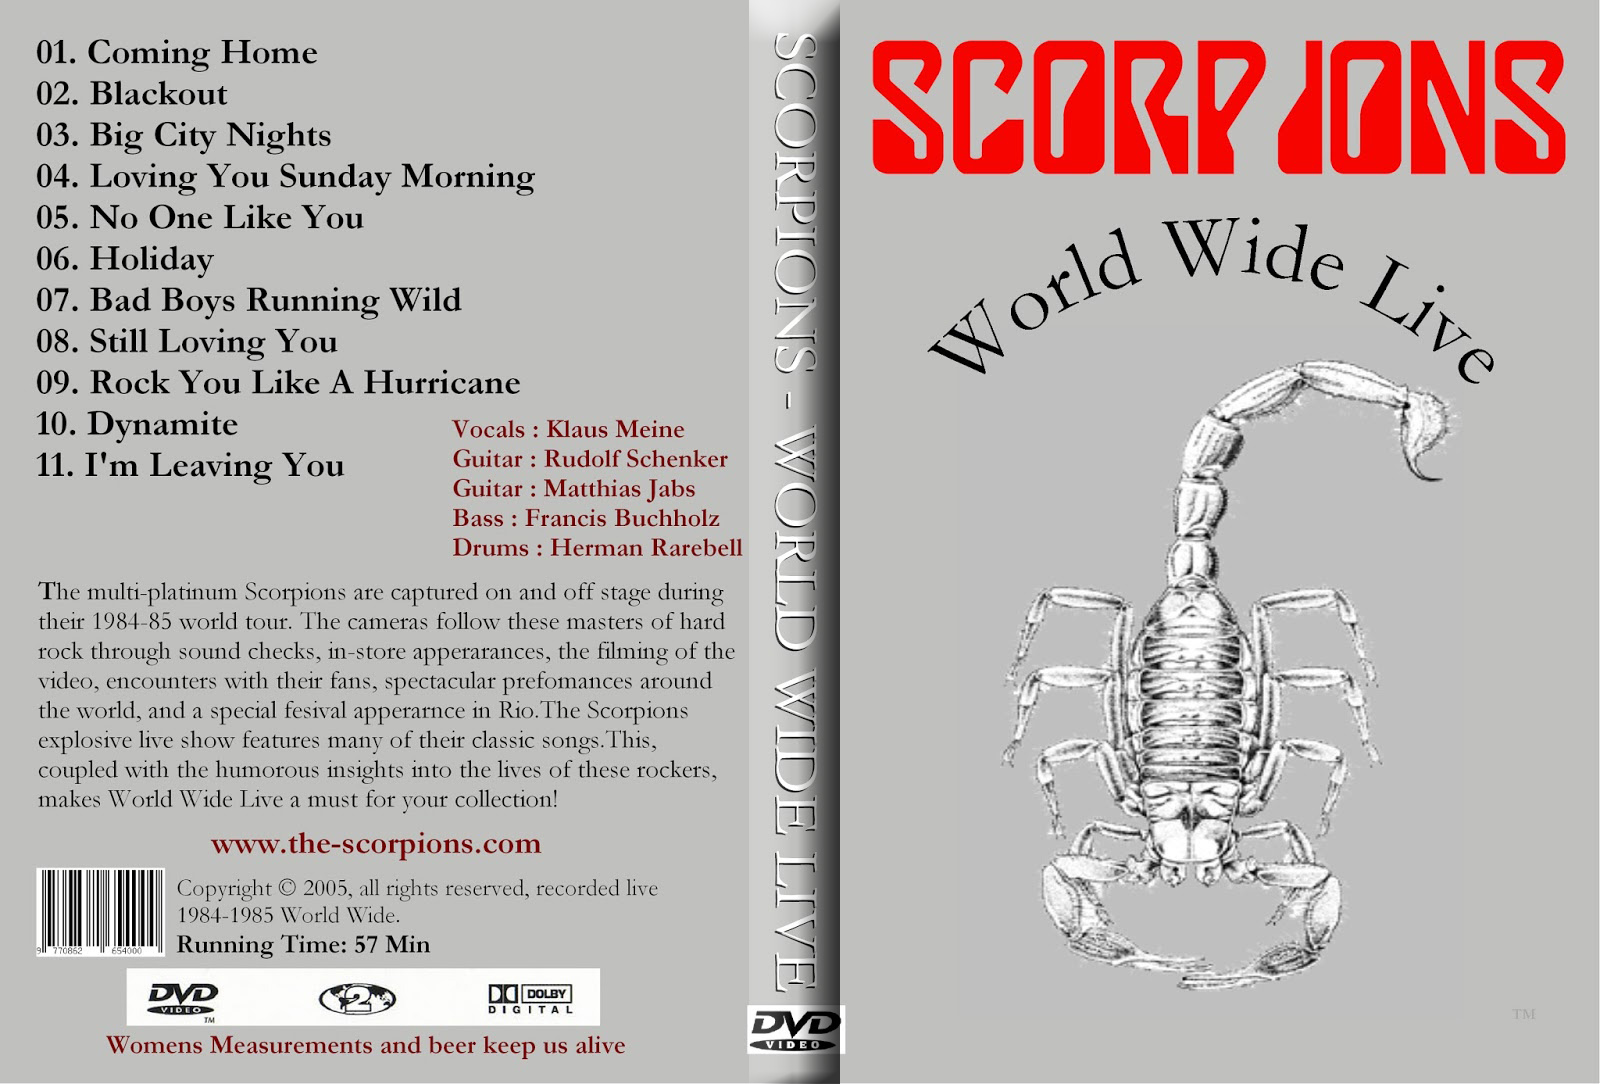 Scorpions World Wide Live DVD-R Scorpions 2BWorld 2BWide 2BLive 2BDVD R 2BXANDAODOWNLOAD